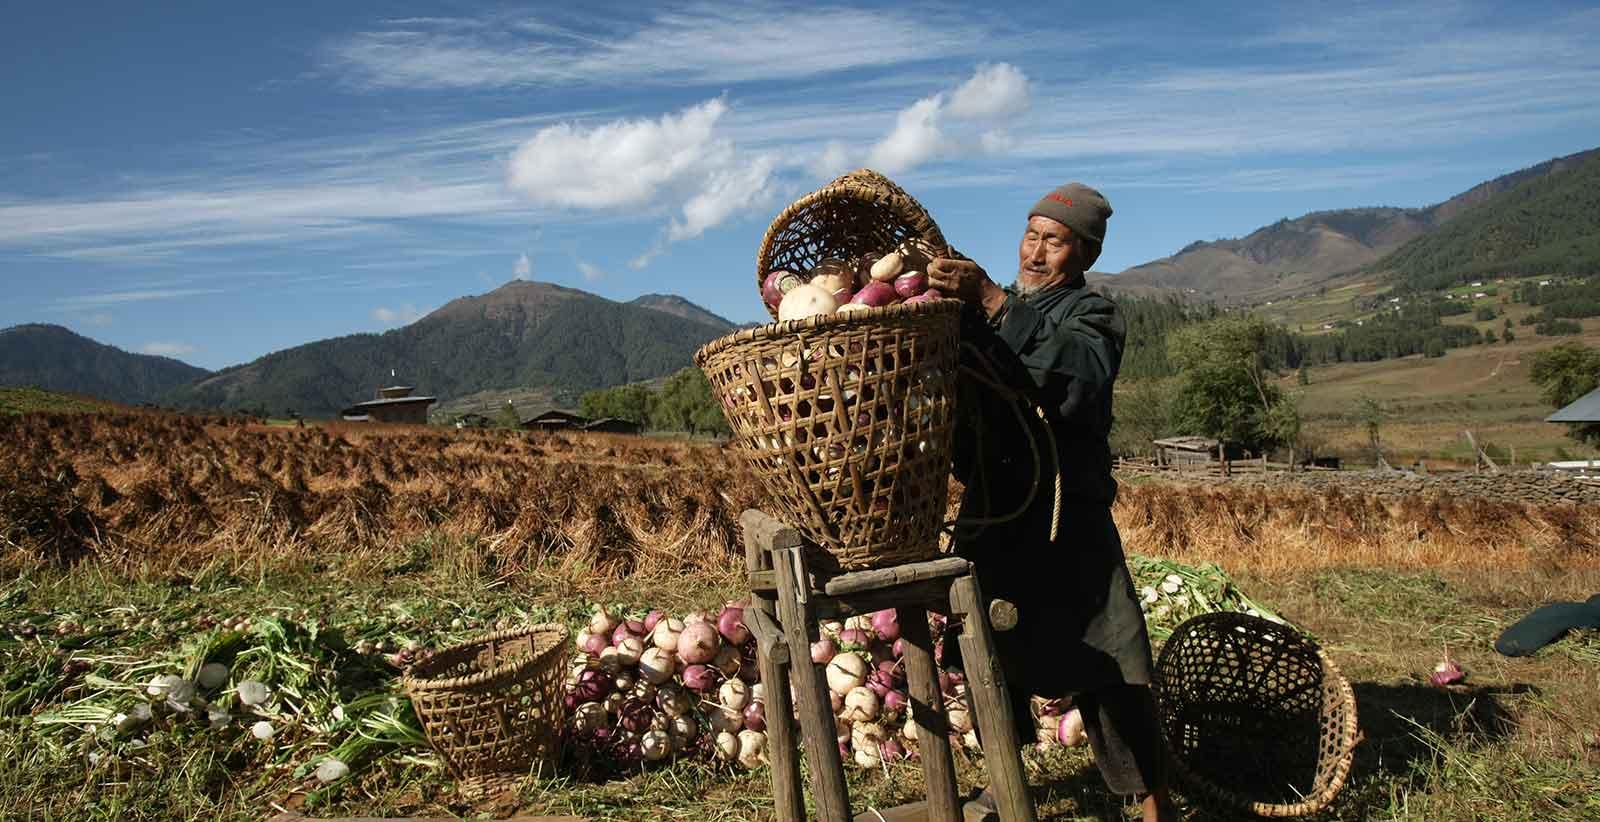 Farmer Harvesting Turnip in Phobjikha Valley